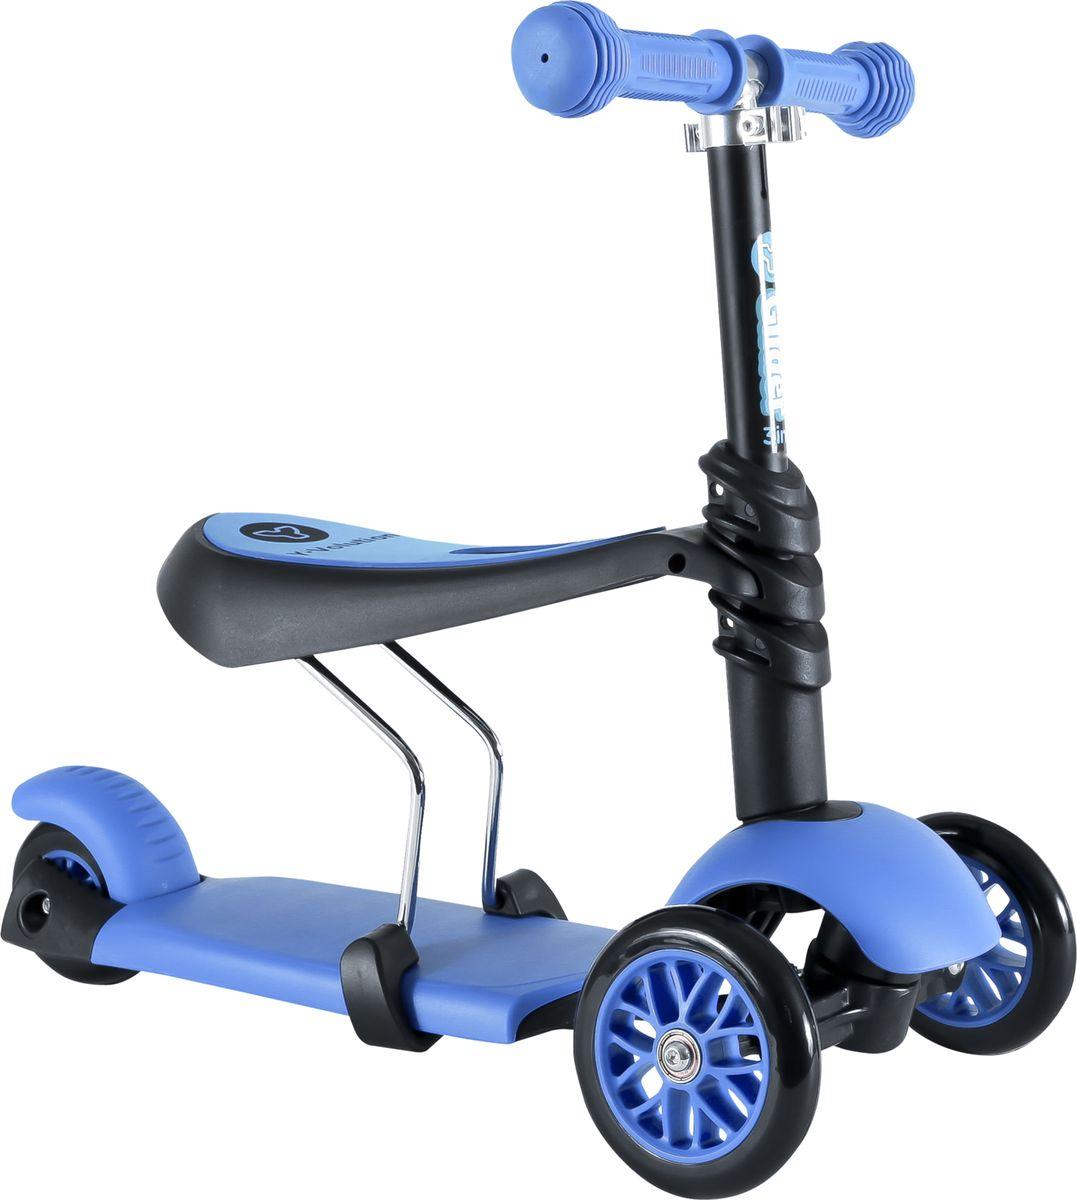 YVolution Самокат-беговел Glider 3 в 1 цвет синий -  Беговелы